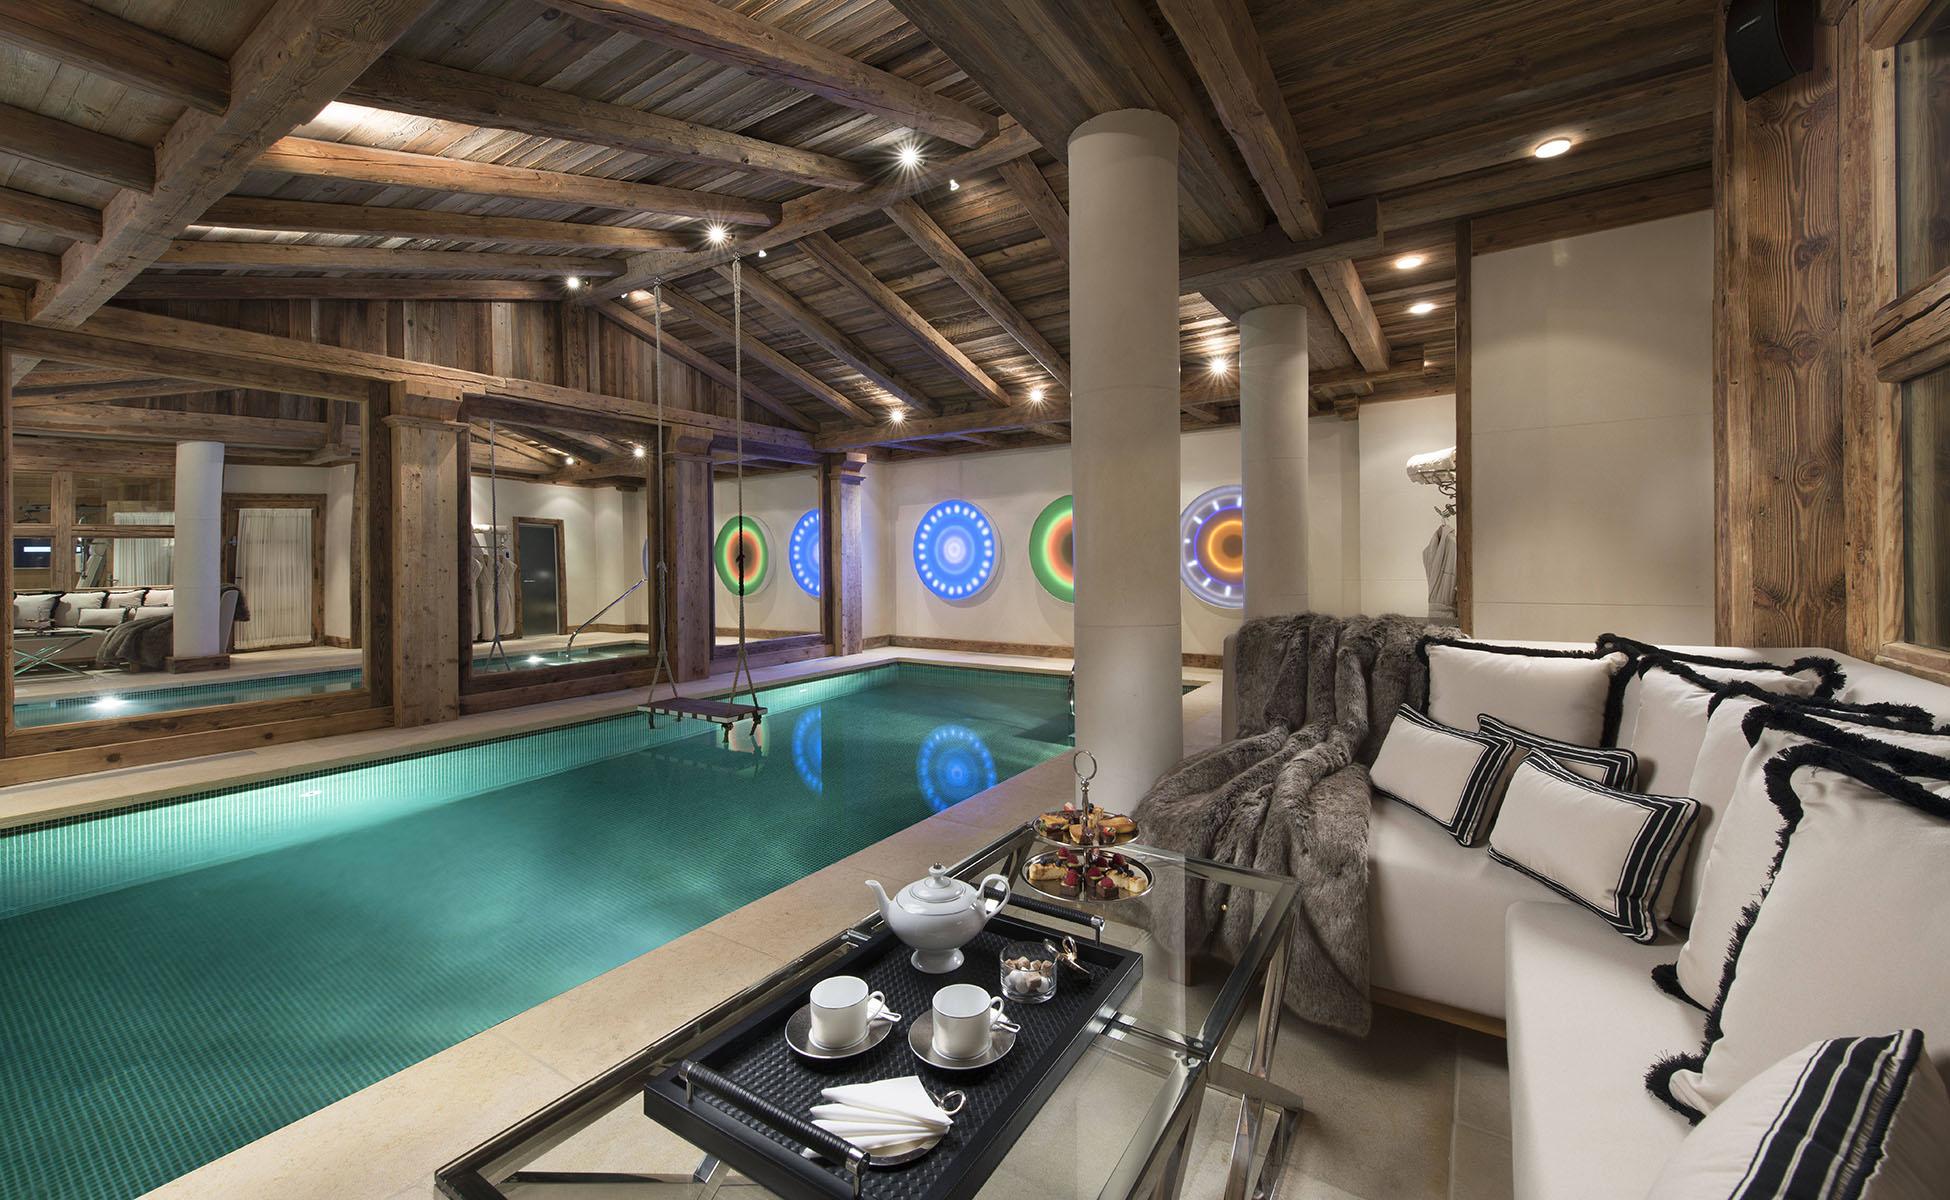 Lovelydays luxury service apartment rental - Courchevel - Great Roc Chalet - Partner - 7 bedrooms - 6 bathrooms - Inside pool - 7fdd20d143a4 - Lovelydays